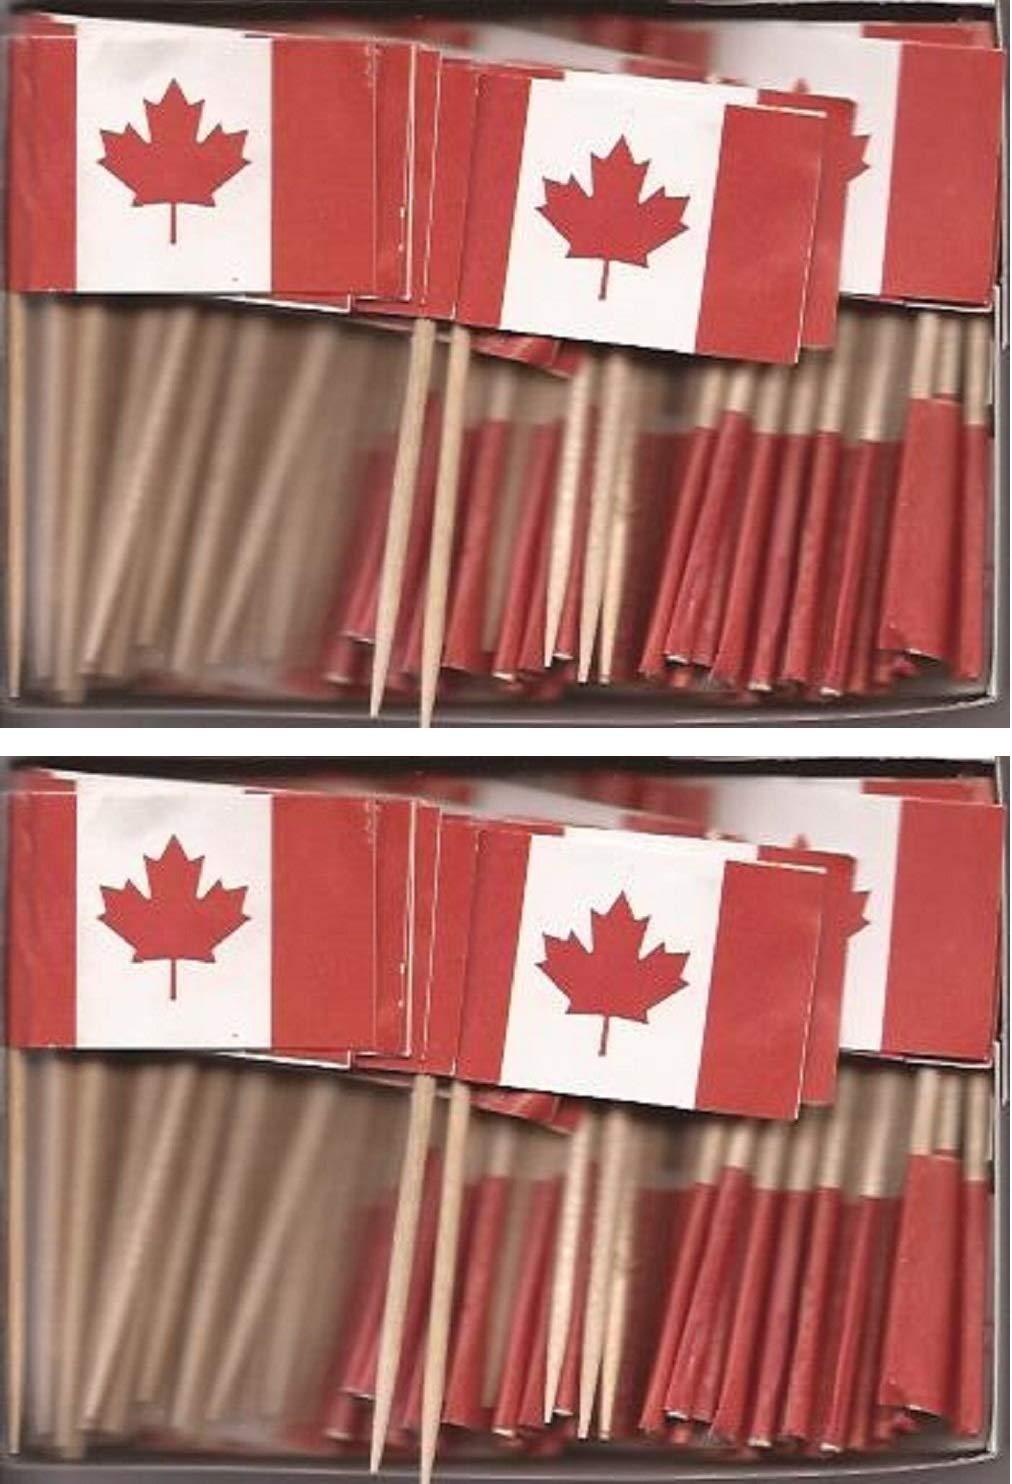 100 Miniature Canada Toothpick Flags, Small Mini Canadian Flag Cupcake Toothpicks or Cocktail Sticks & Picks (1 Box)